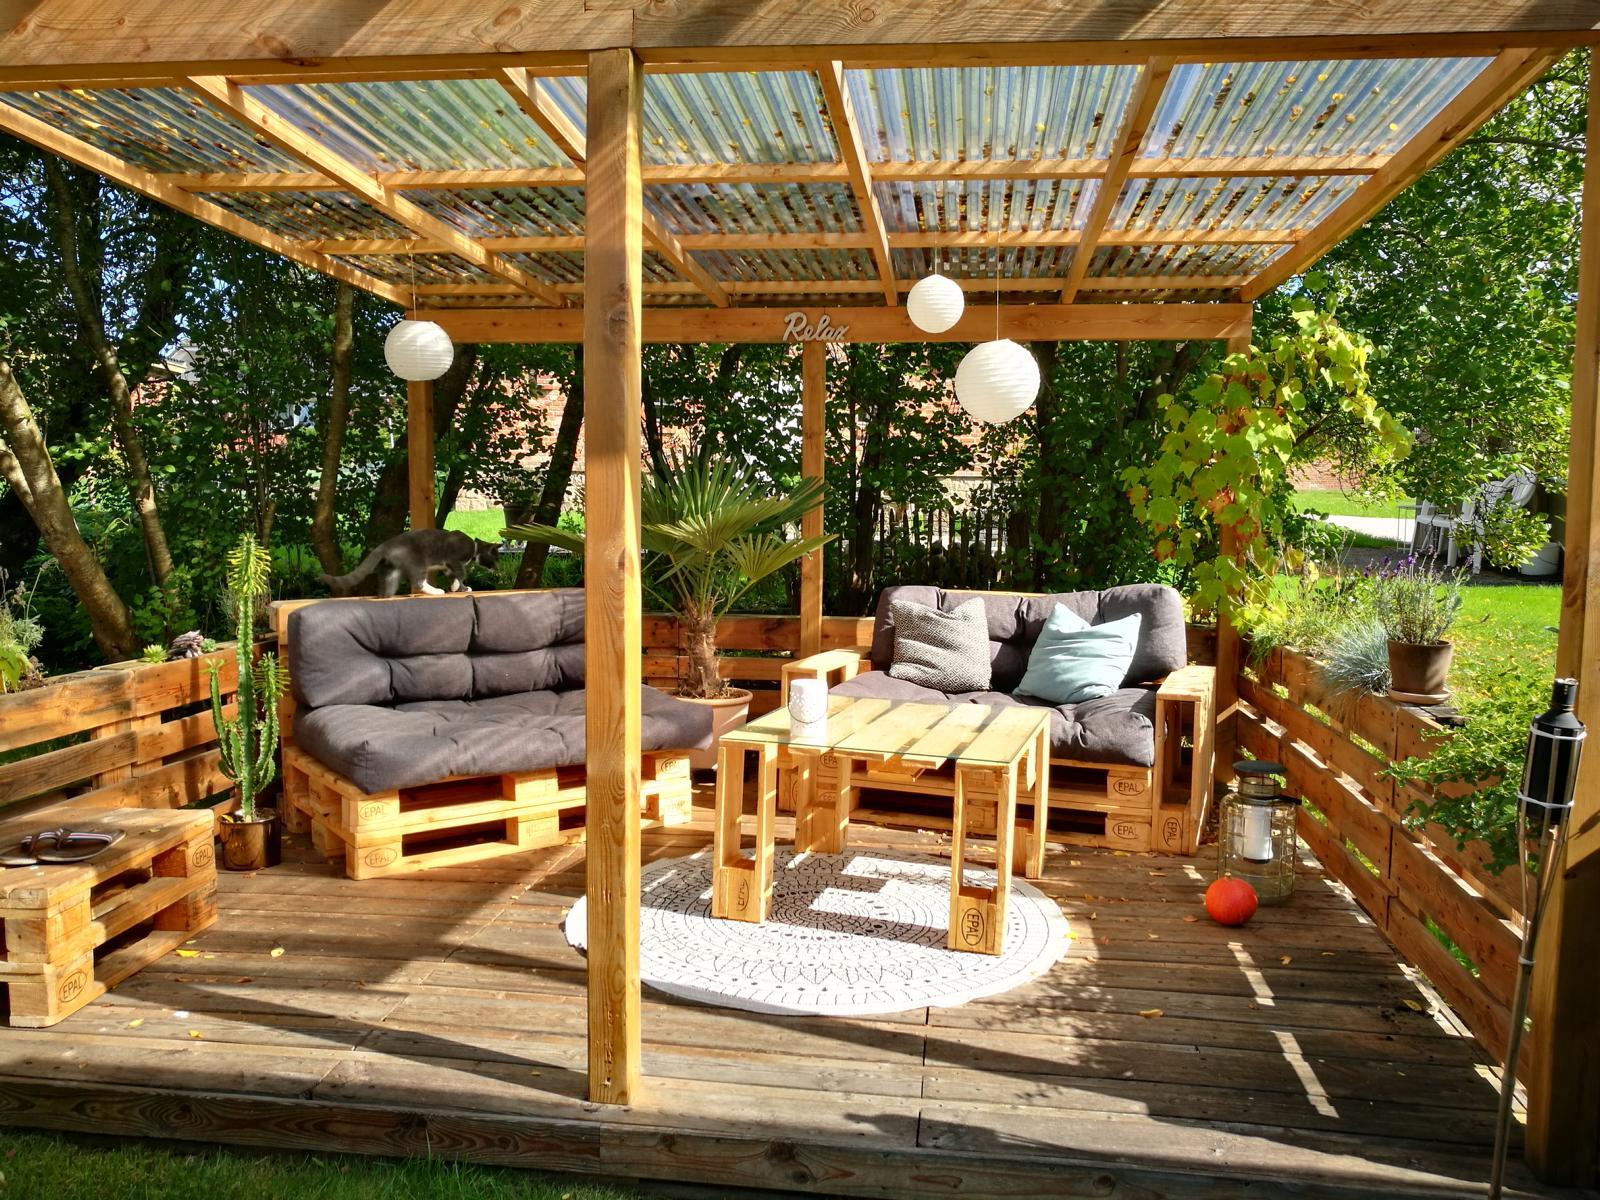 terrasse aus paletten selber bauen europaletten diy anleitung. Black Bedroom Furniture Sets. Home Design Ideas